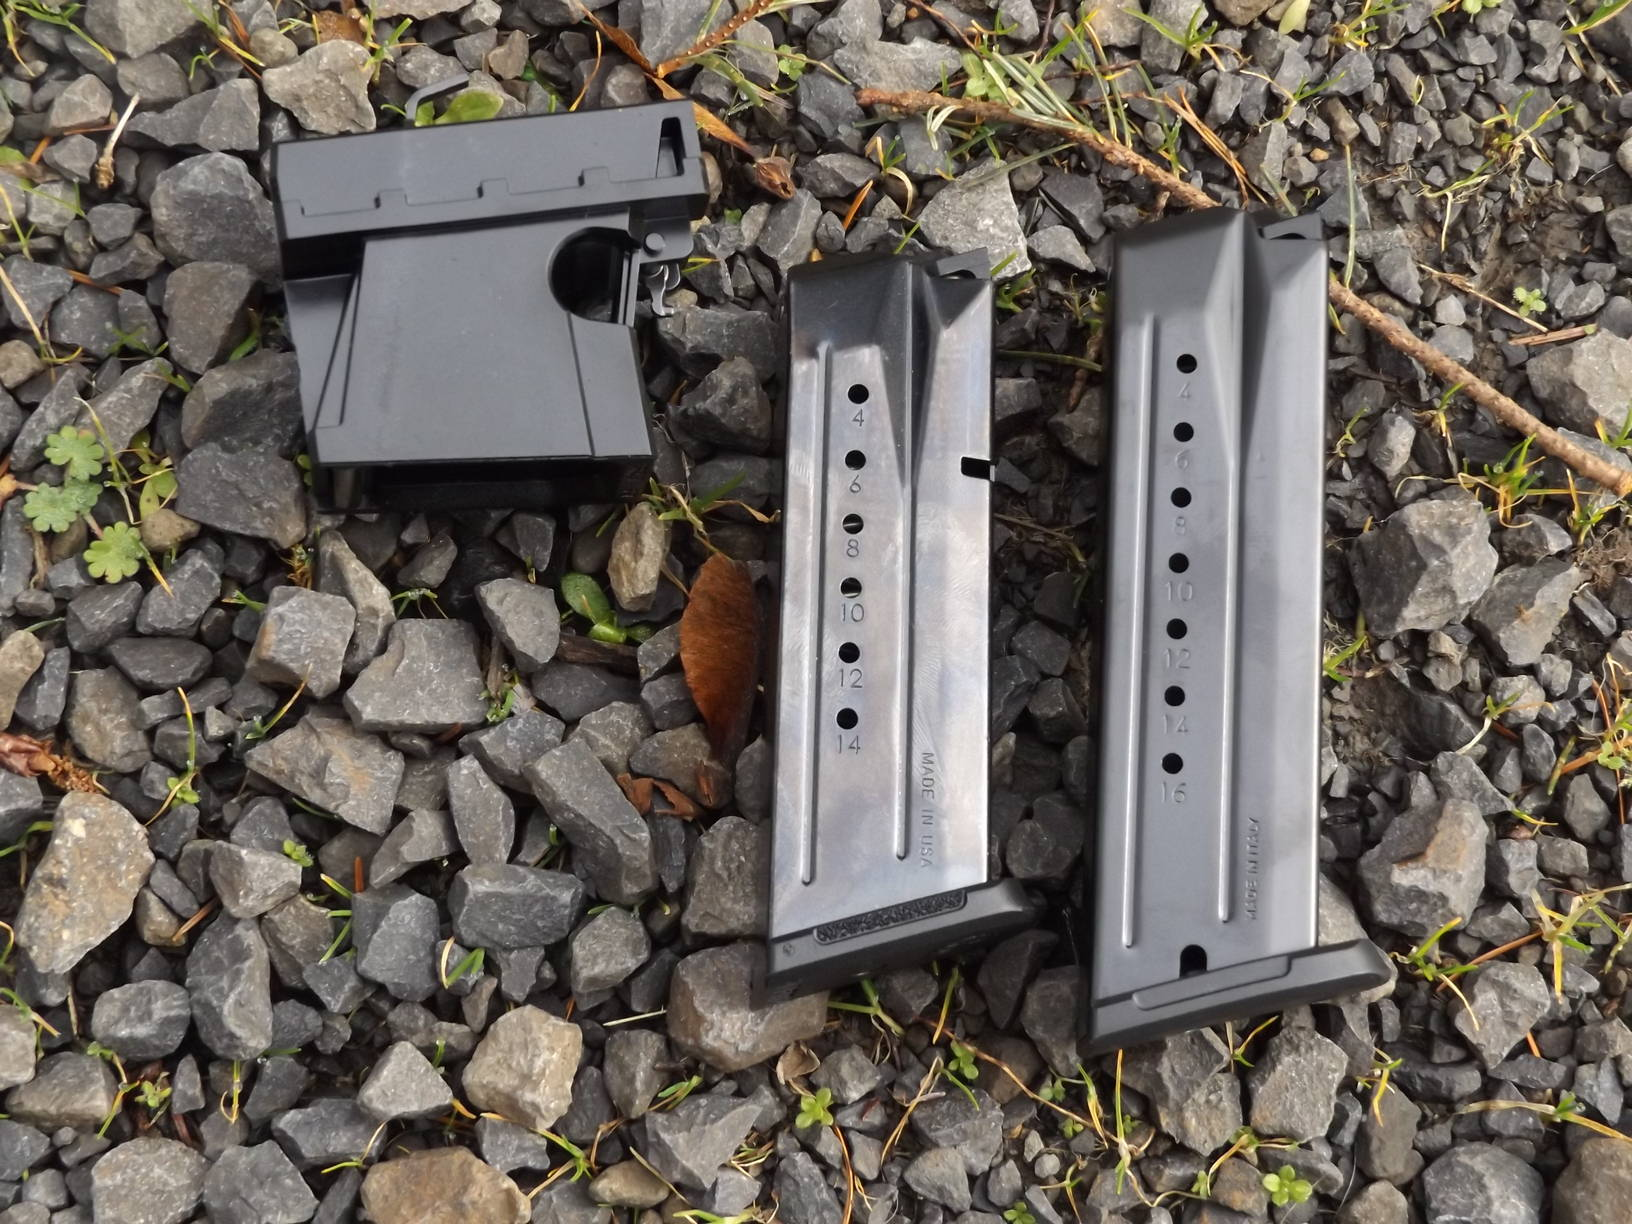 Ruger PC9, 9mm Carbine, by Pat Cascio - SurvivalBlog com